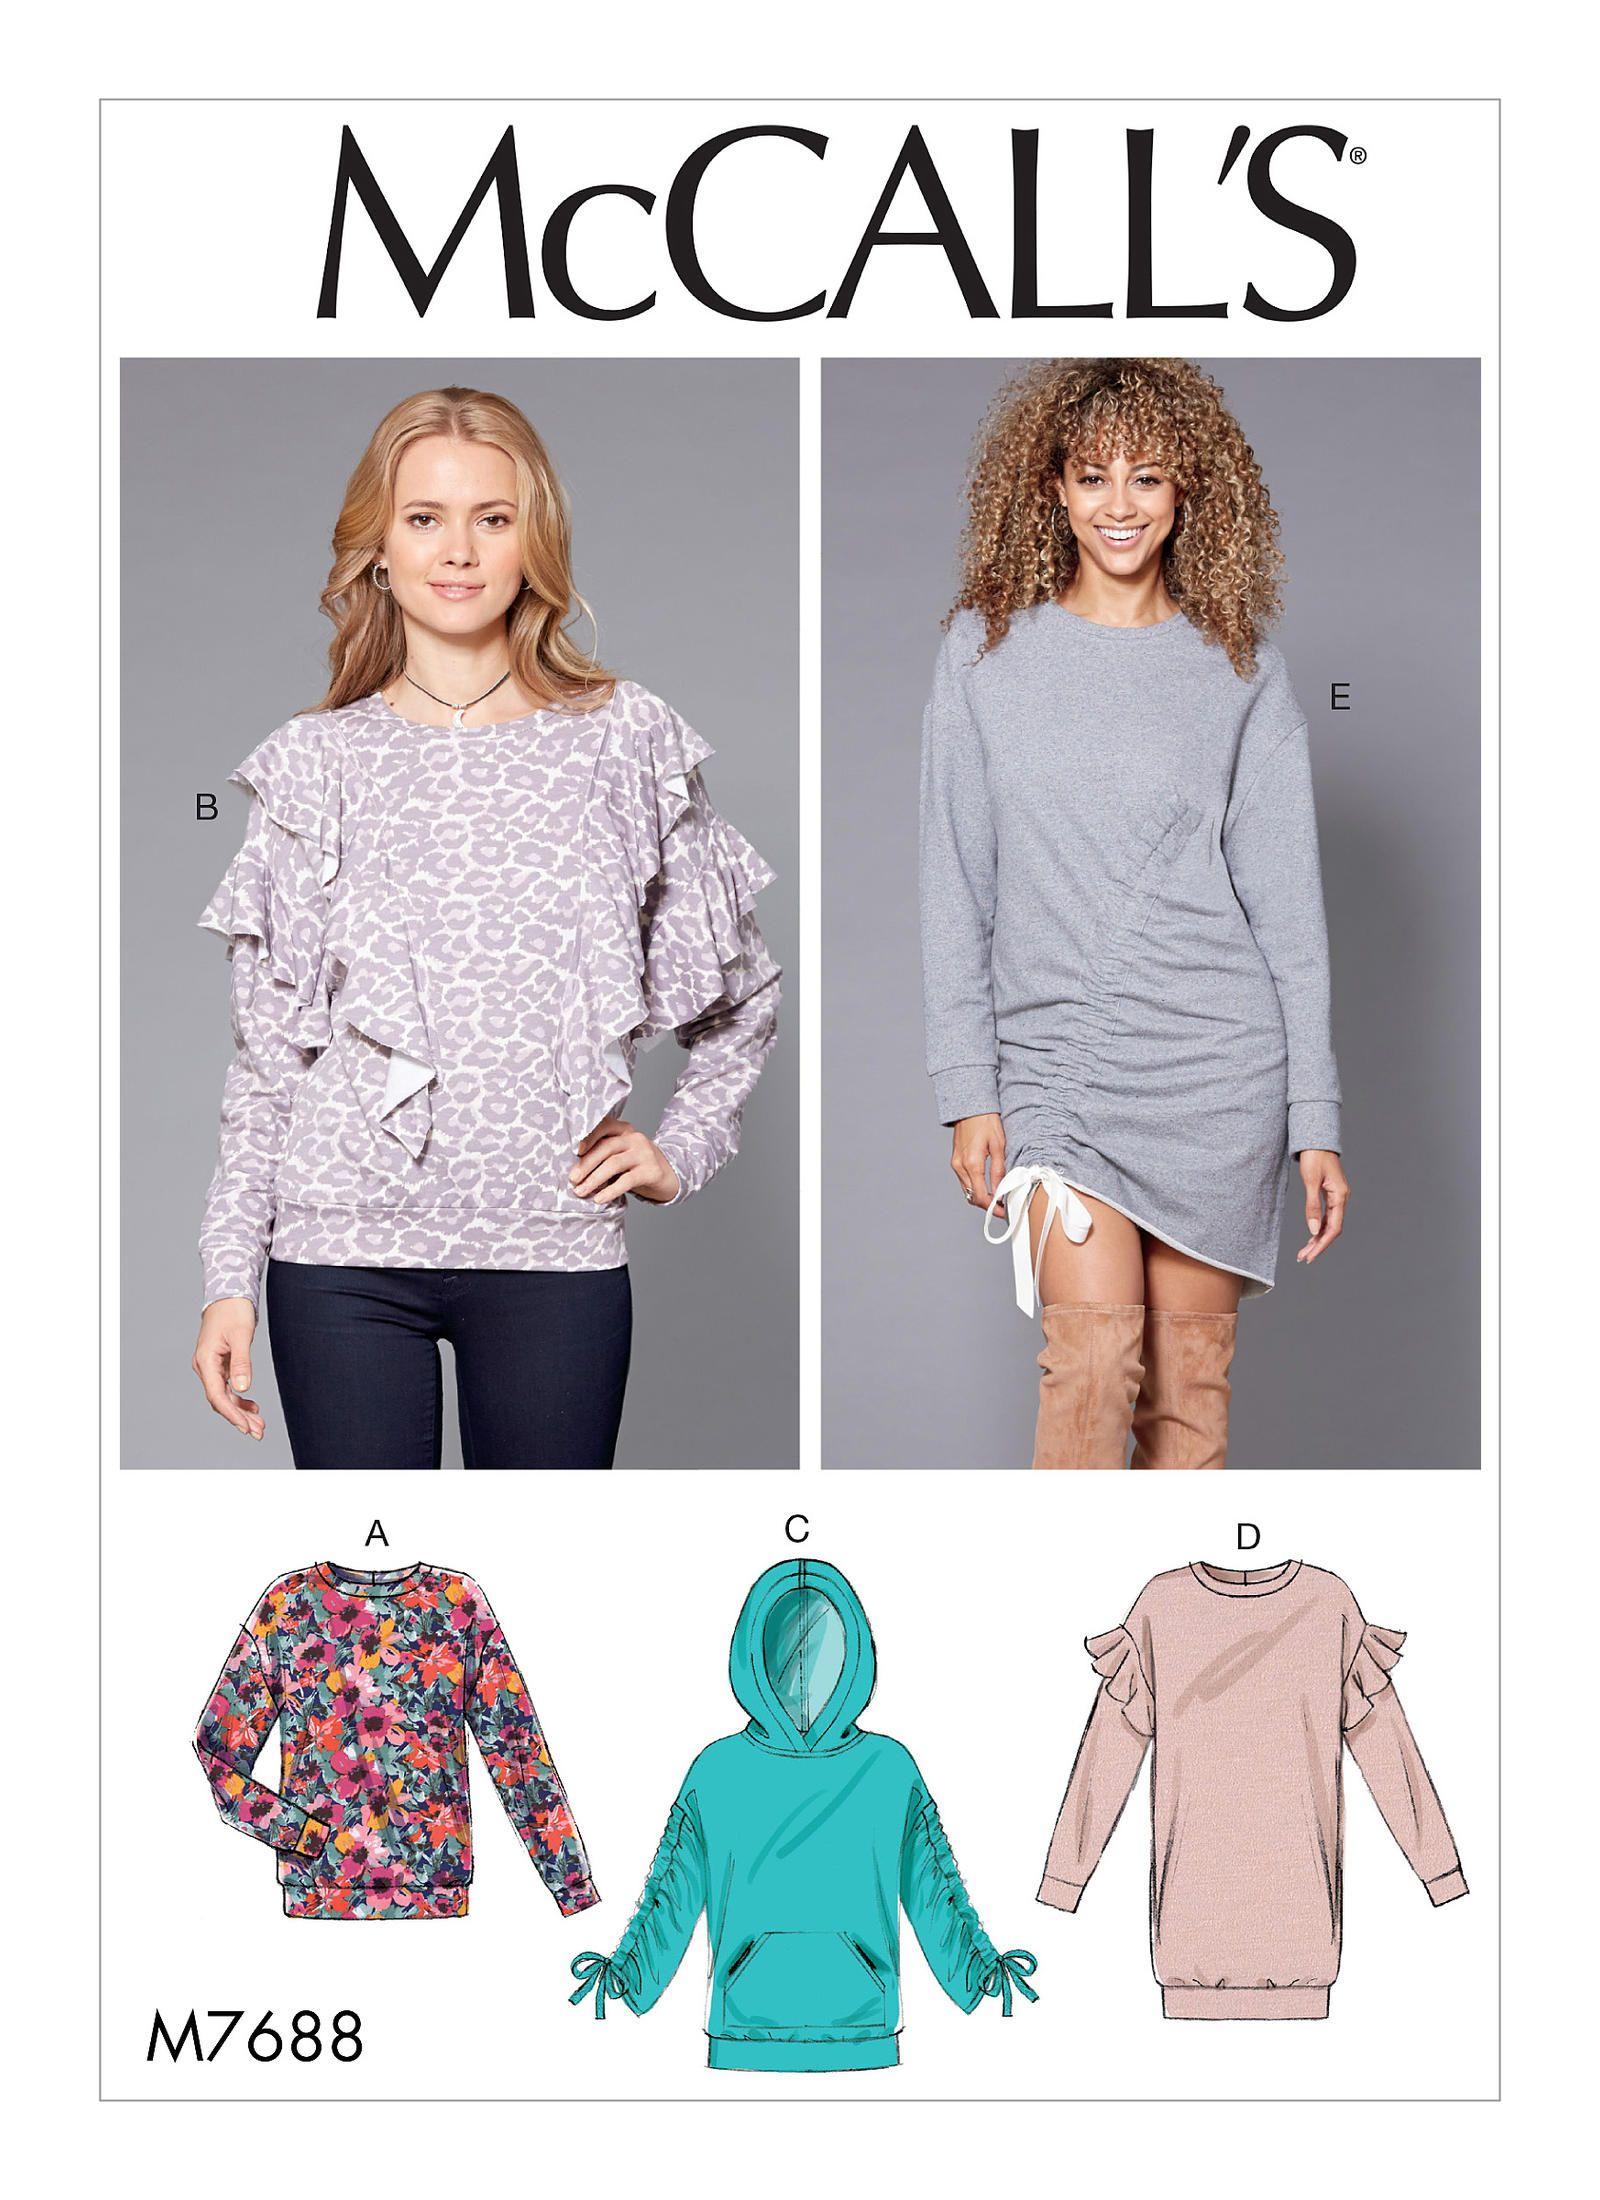 M7688 | McCall\'s Patterns | Sewing Patterns | MBV Patterns | Pinterest